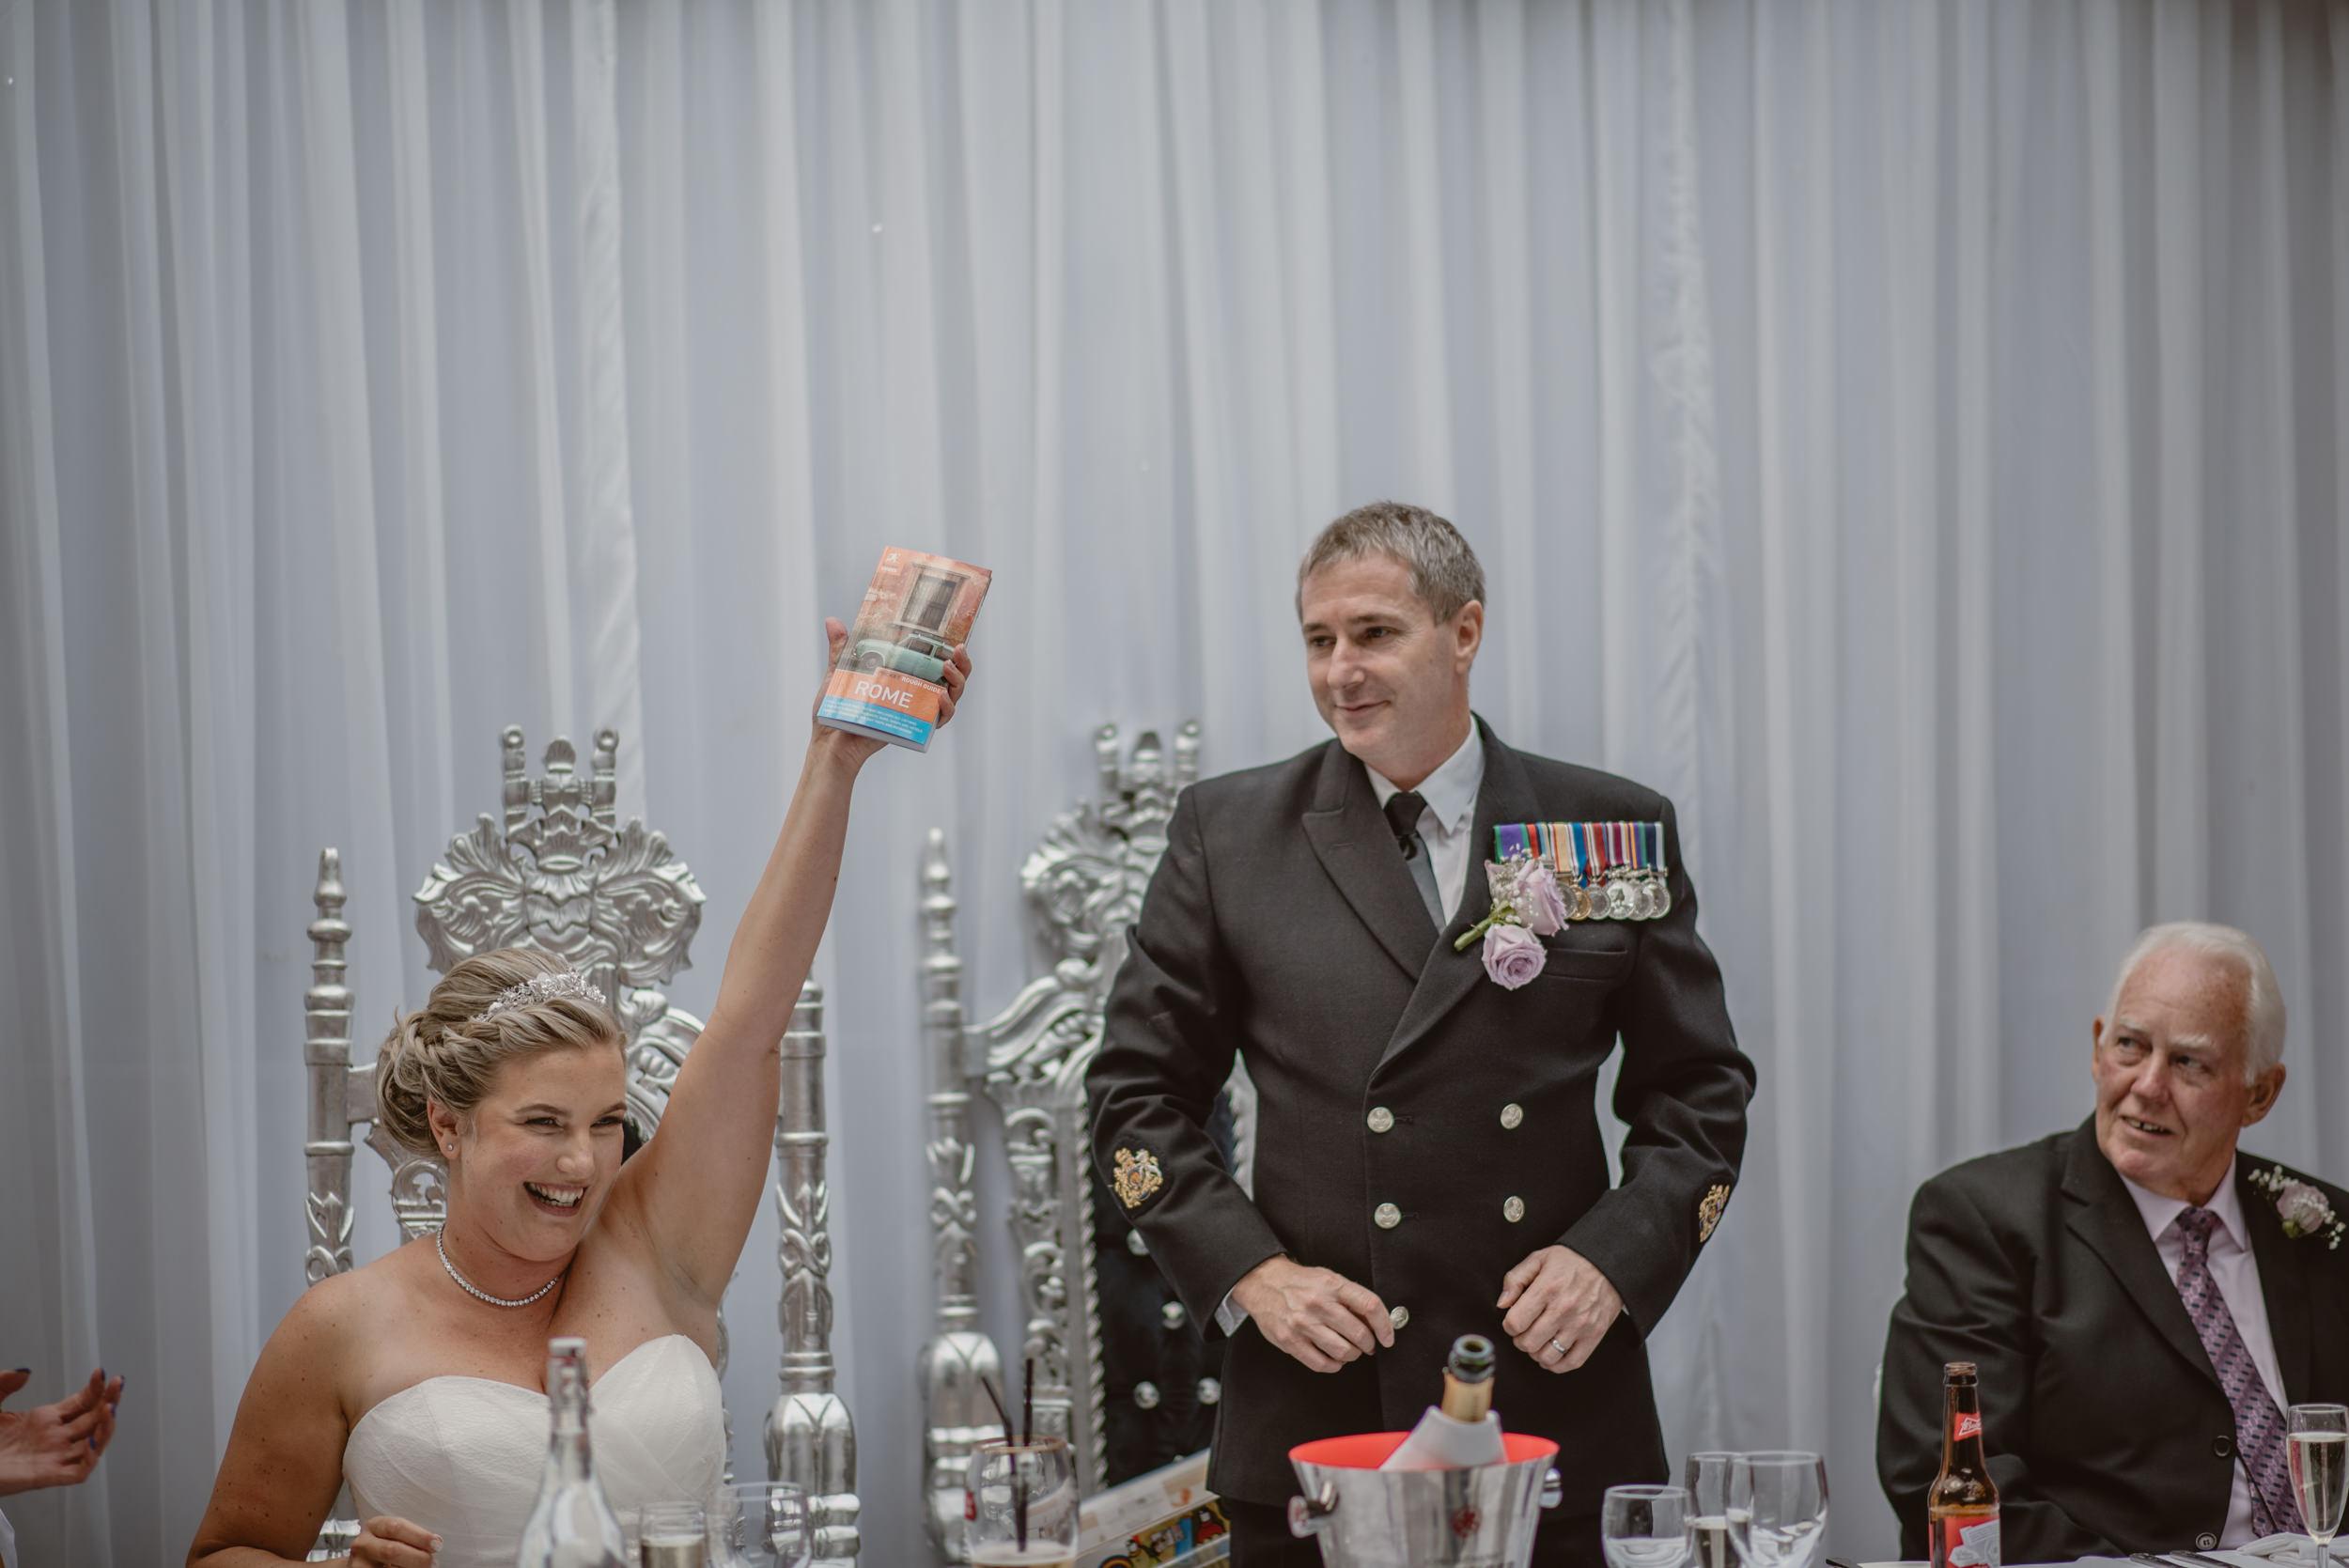 Chantelle-and-Stephen-Old-Thorns-Hotel-Wedding-Liphook-Manu-Mendoza-Wedding-Photography-406.jpg